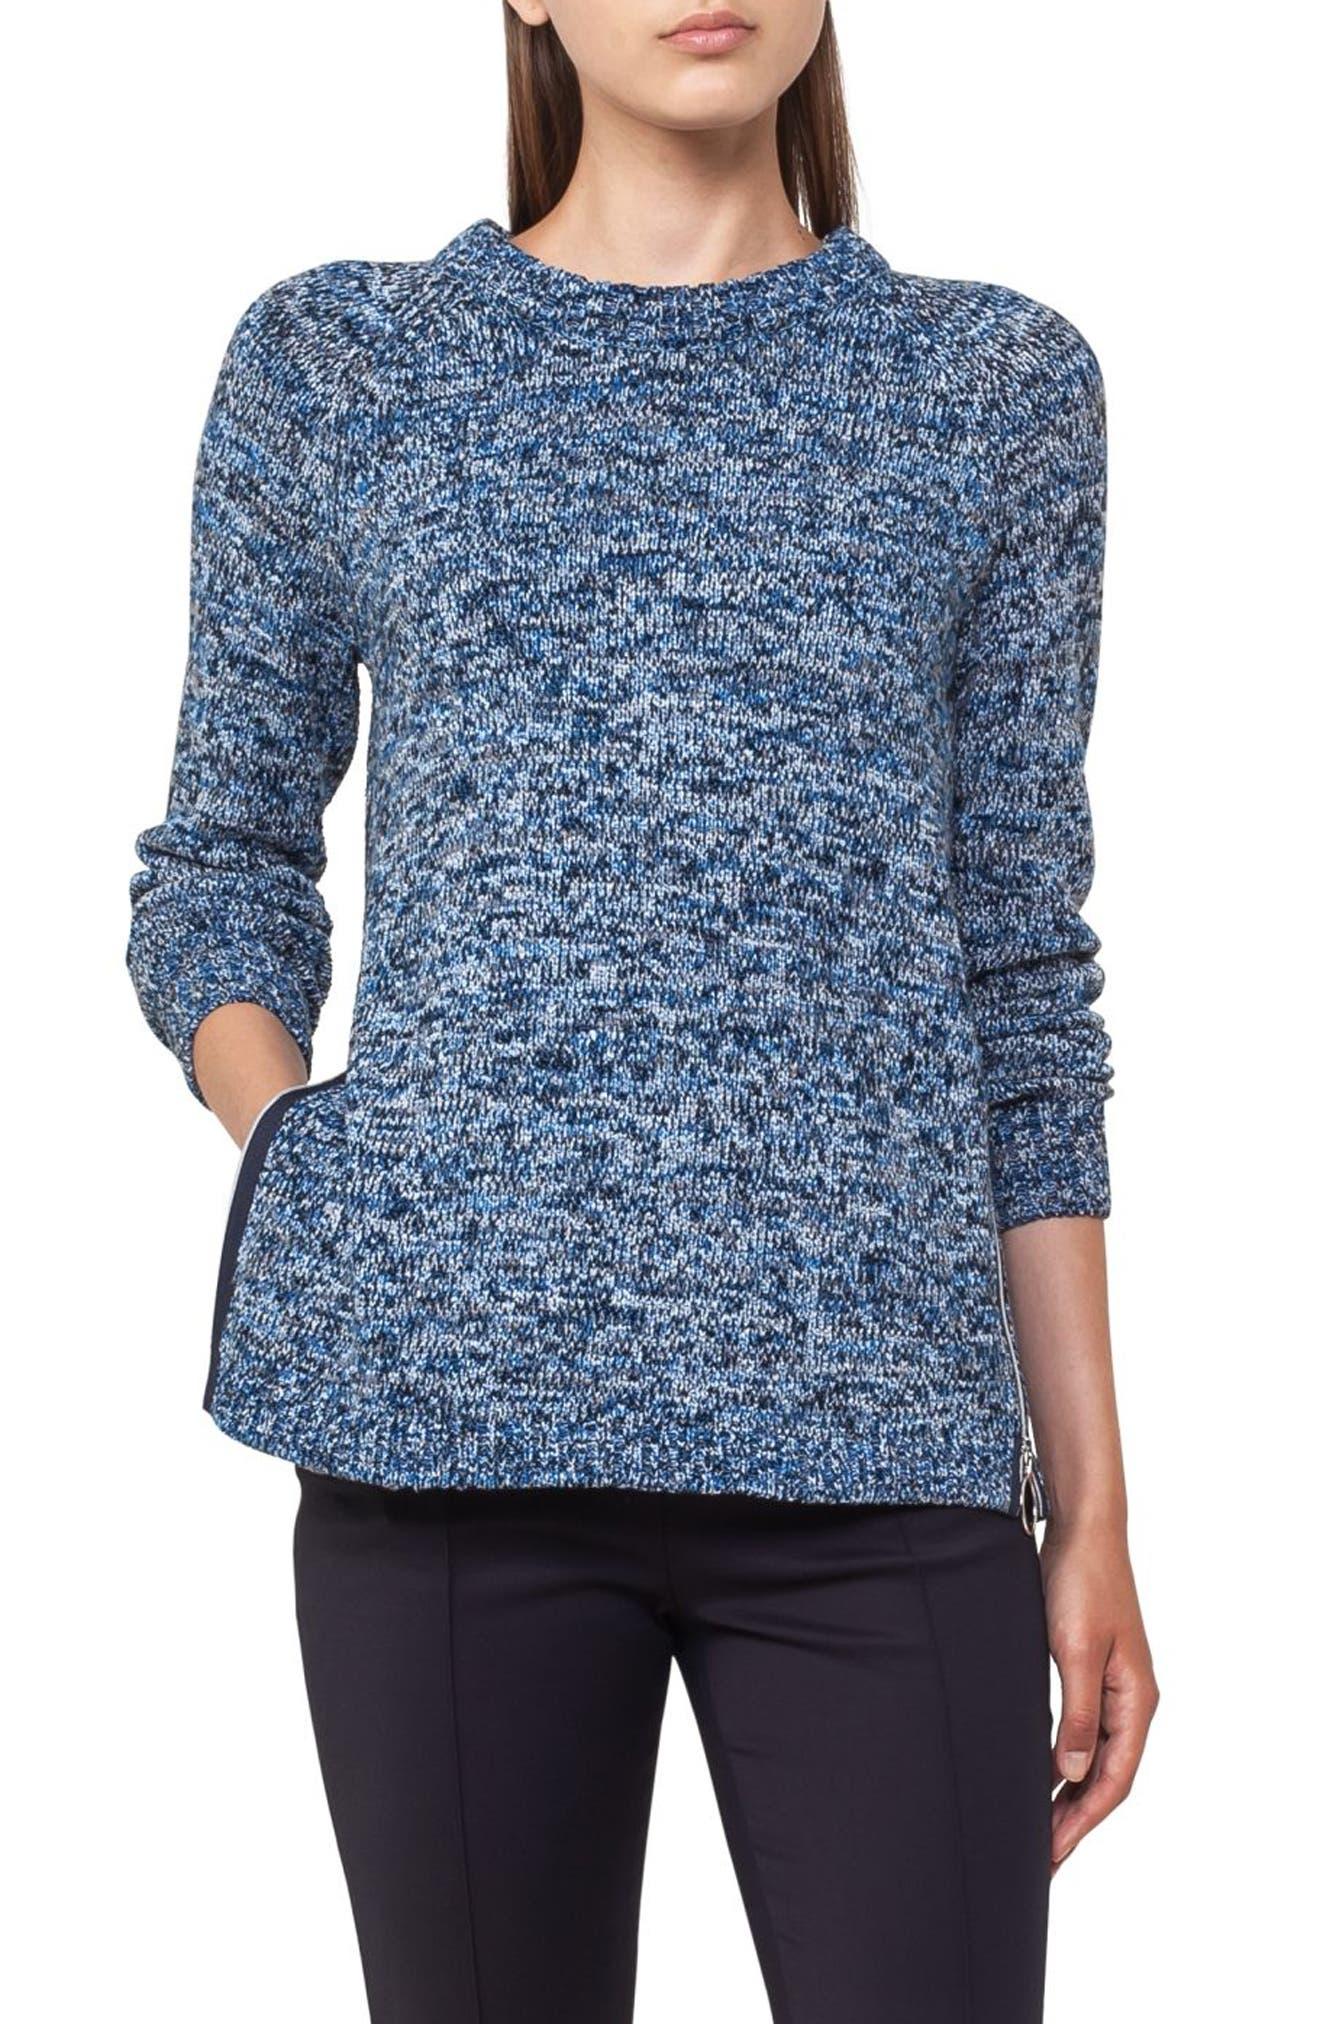 Cotton Blend Knit Pullover,                             Main thumbnail 1, color,                             Indigo-Cream